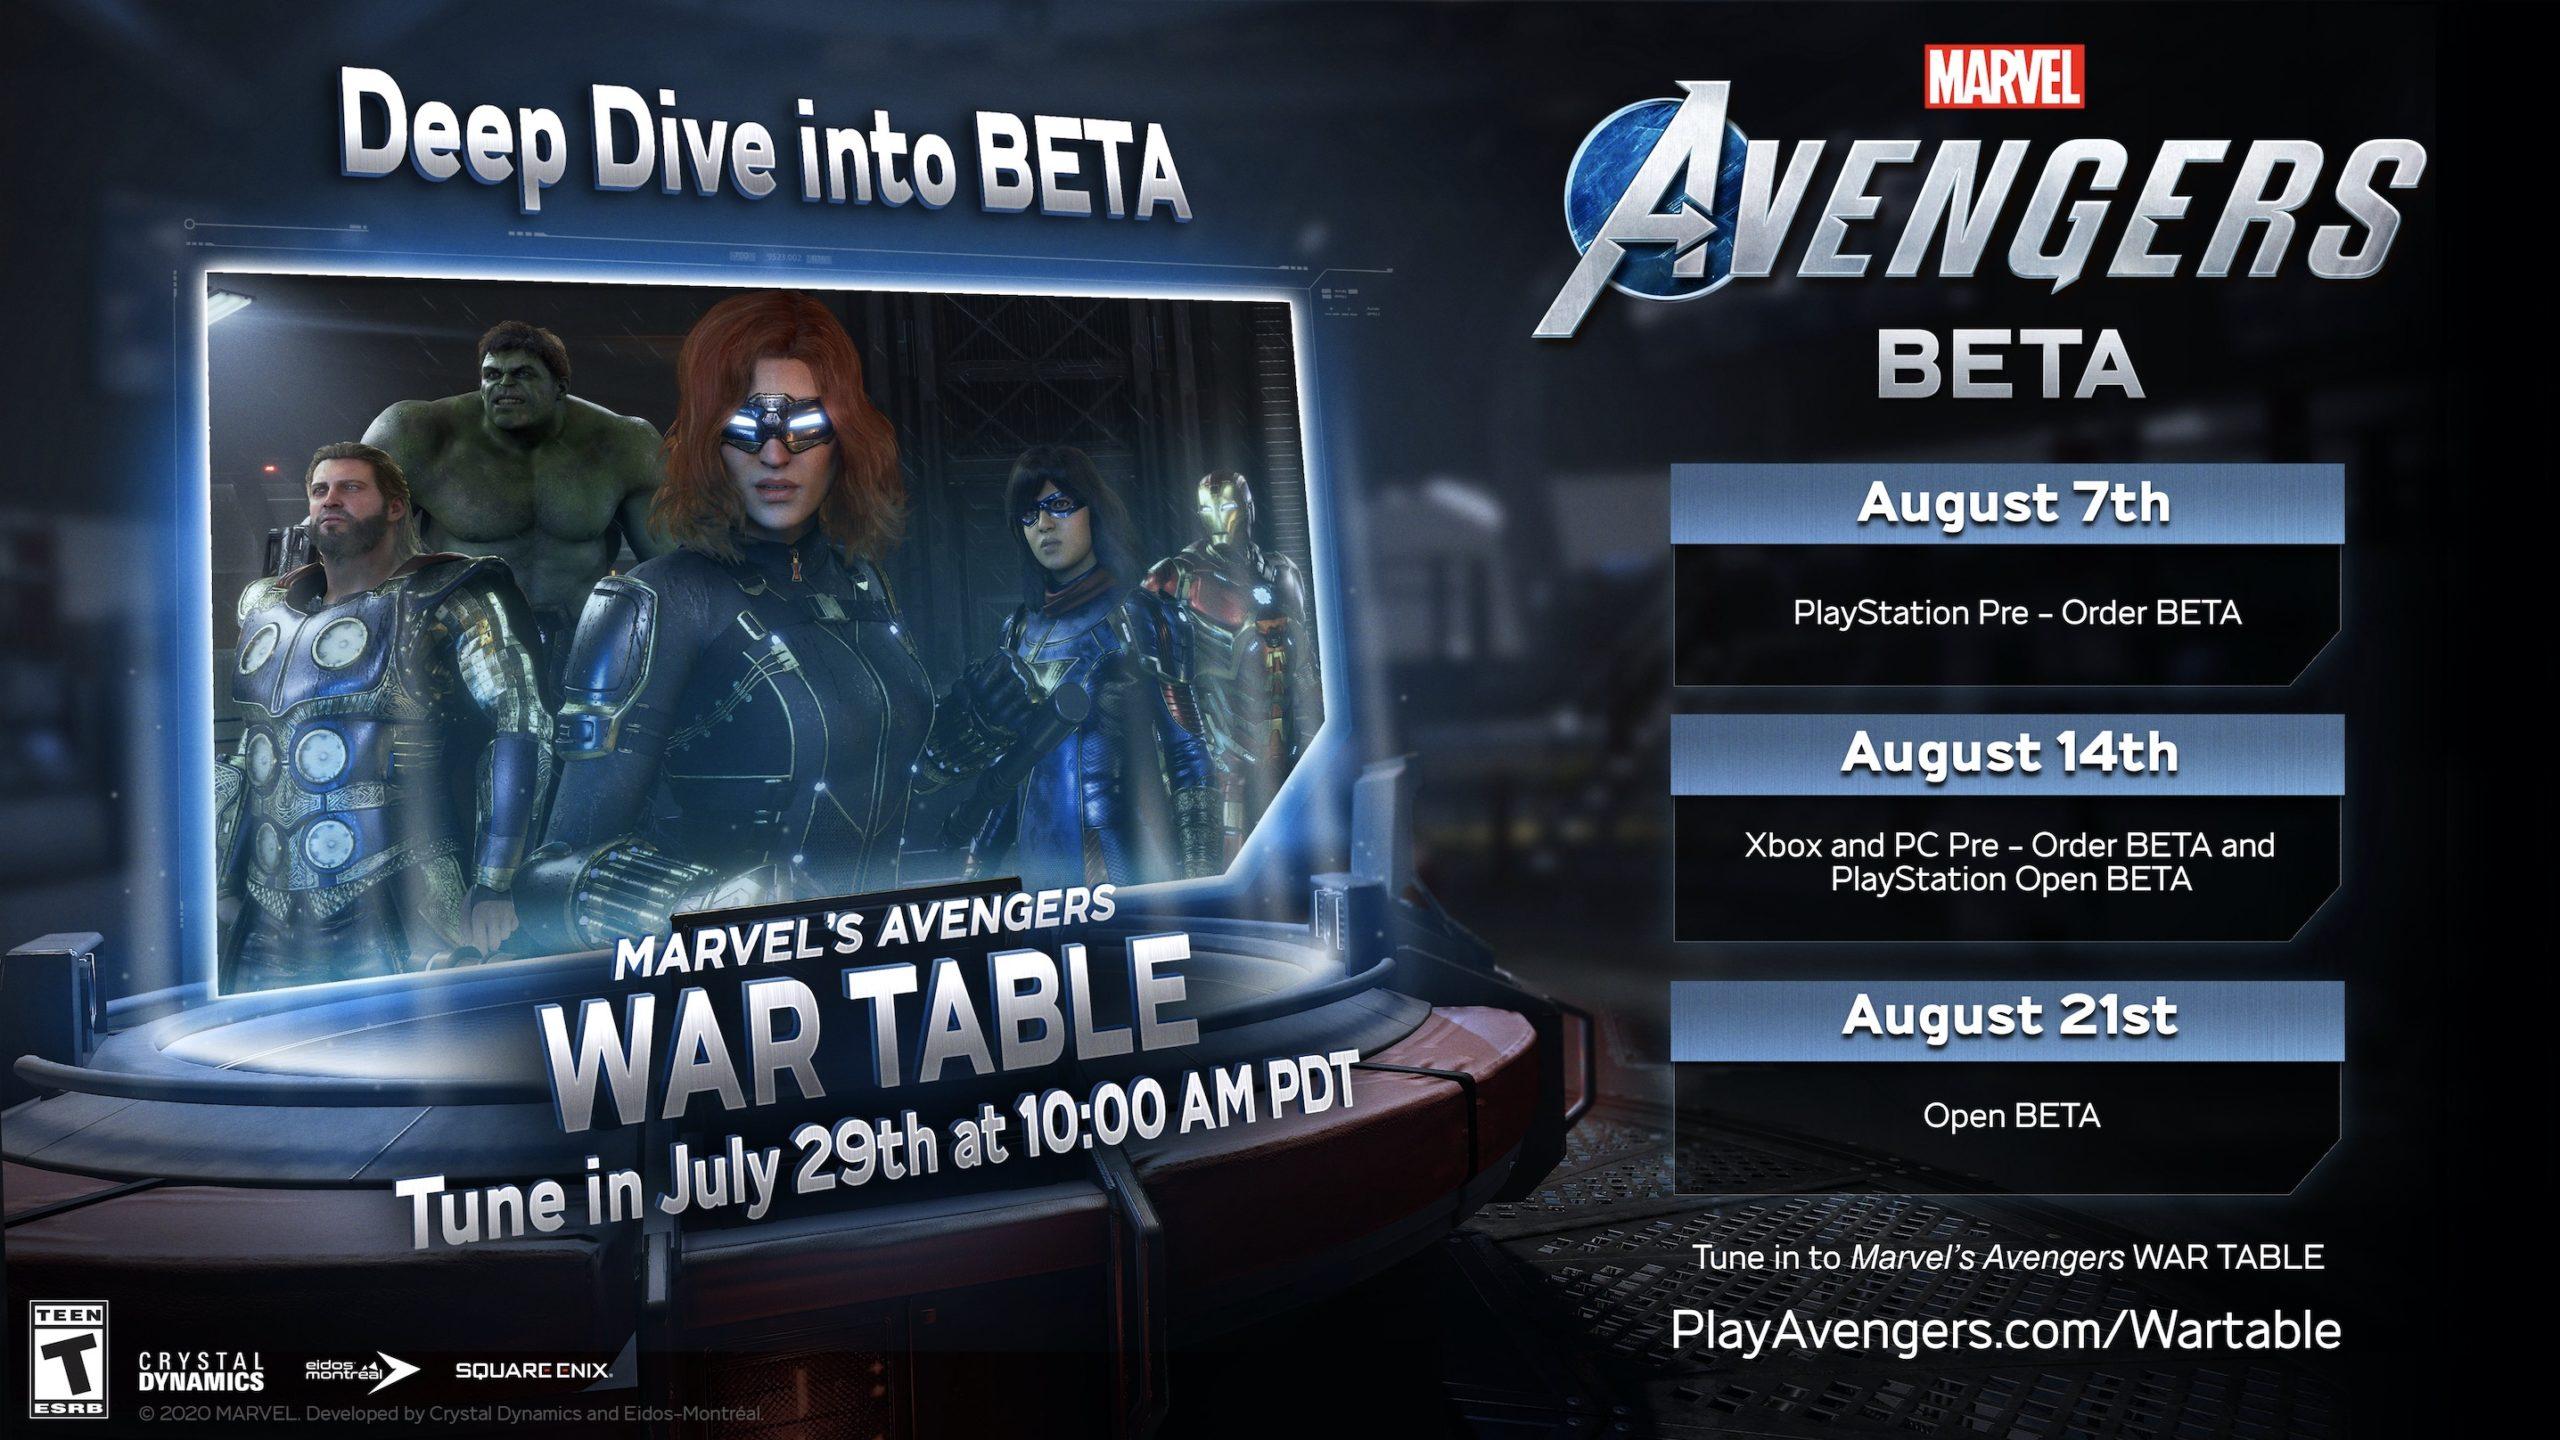 Marvel Avengers beta scaled 1